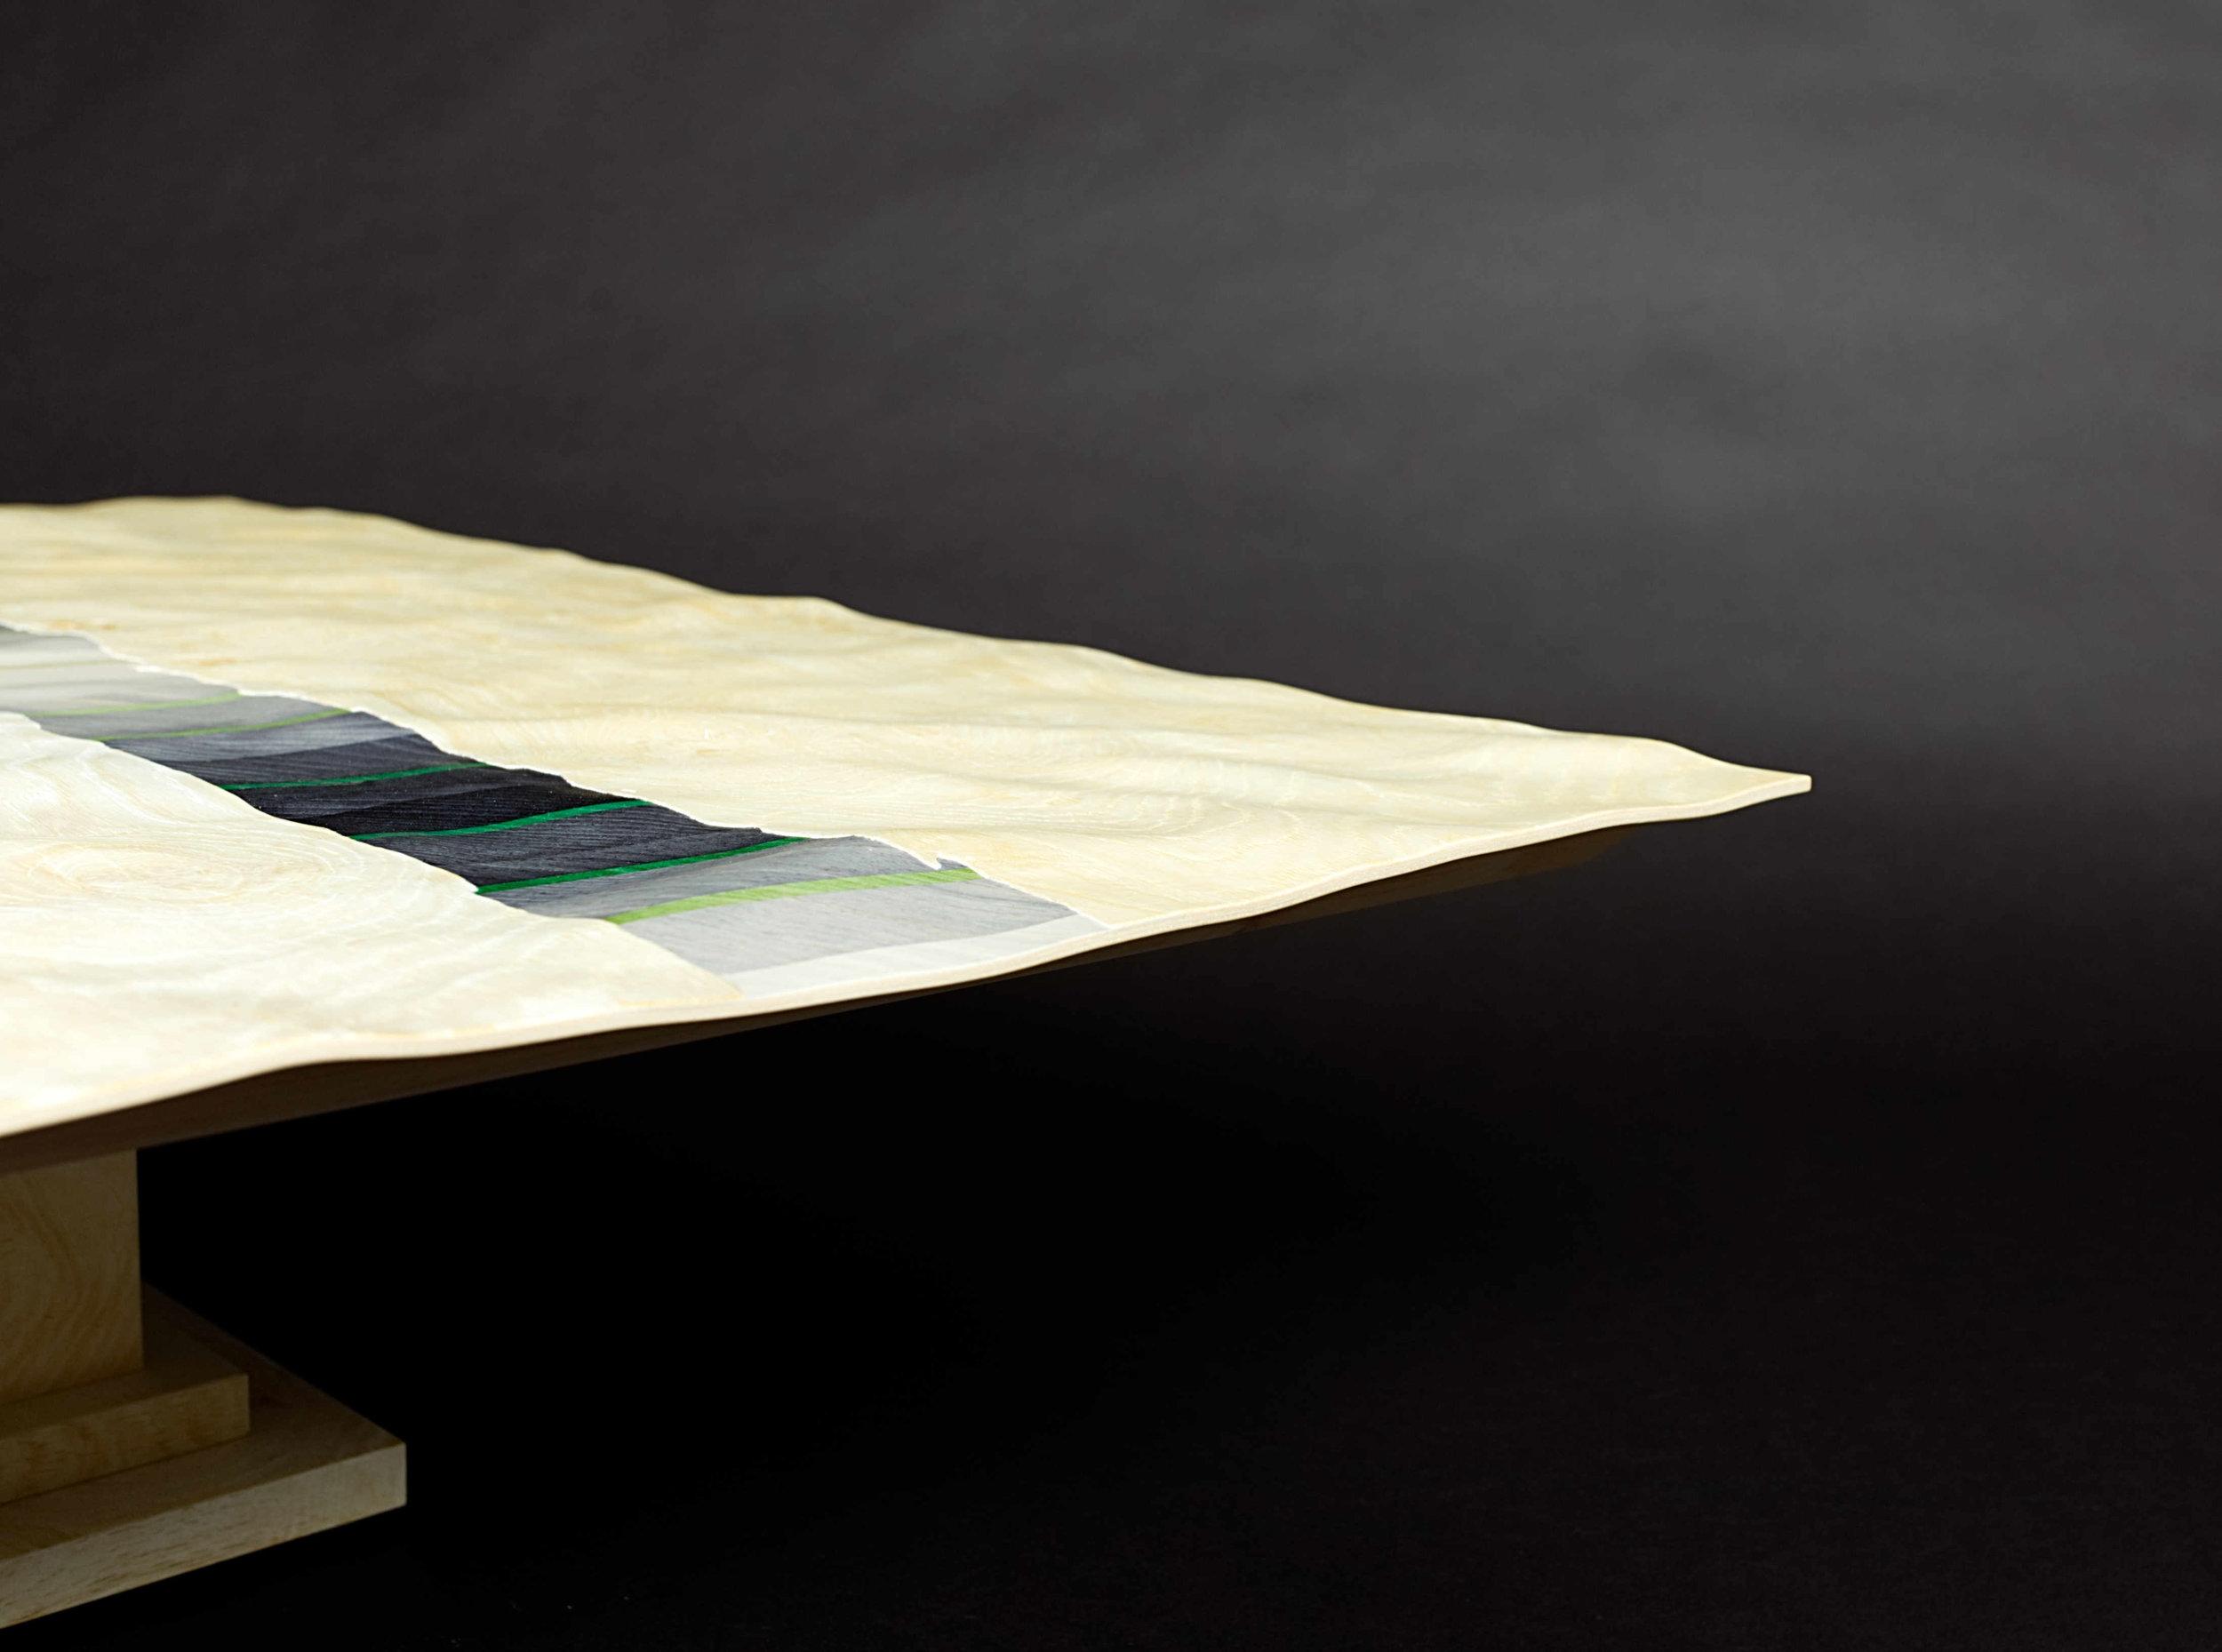 Stone road coffee Table 2.jpg